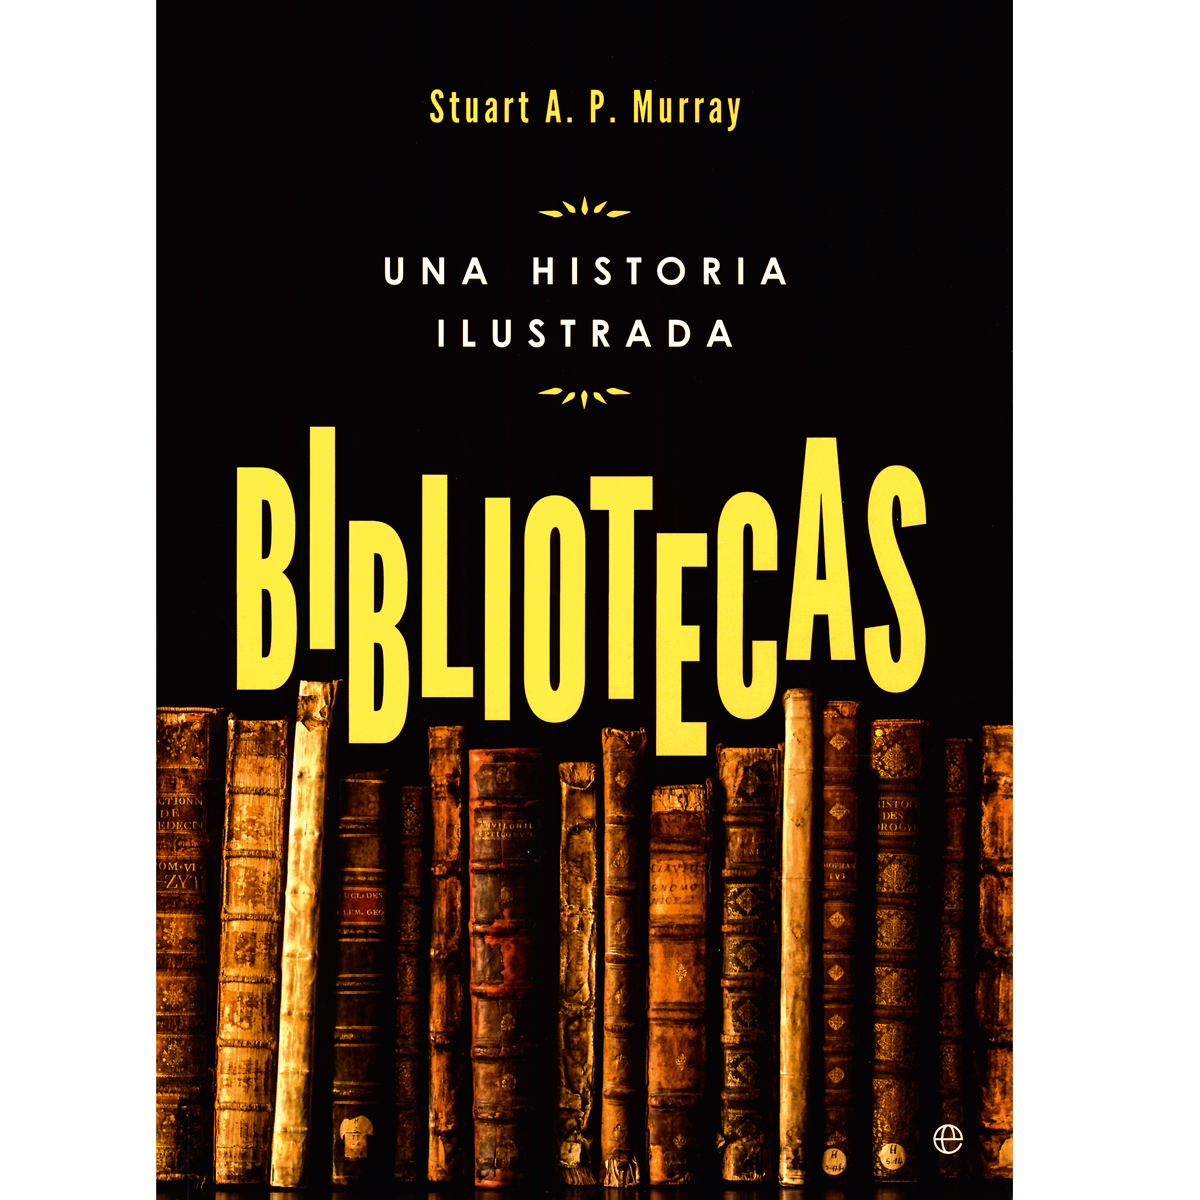 Bibliotecas. Una historia ilustrada